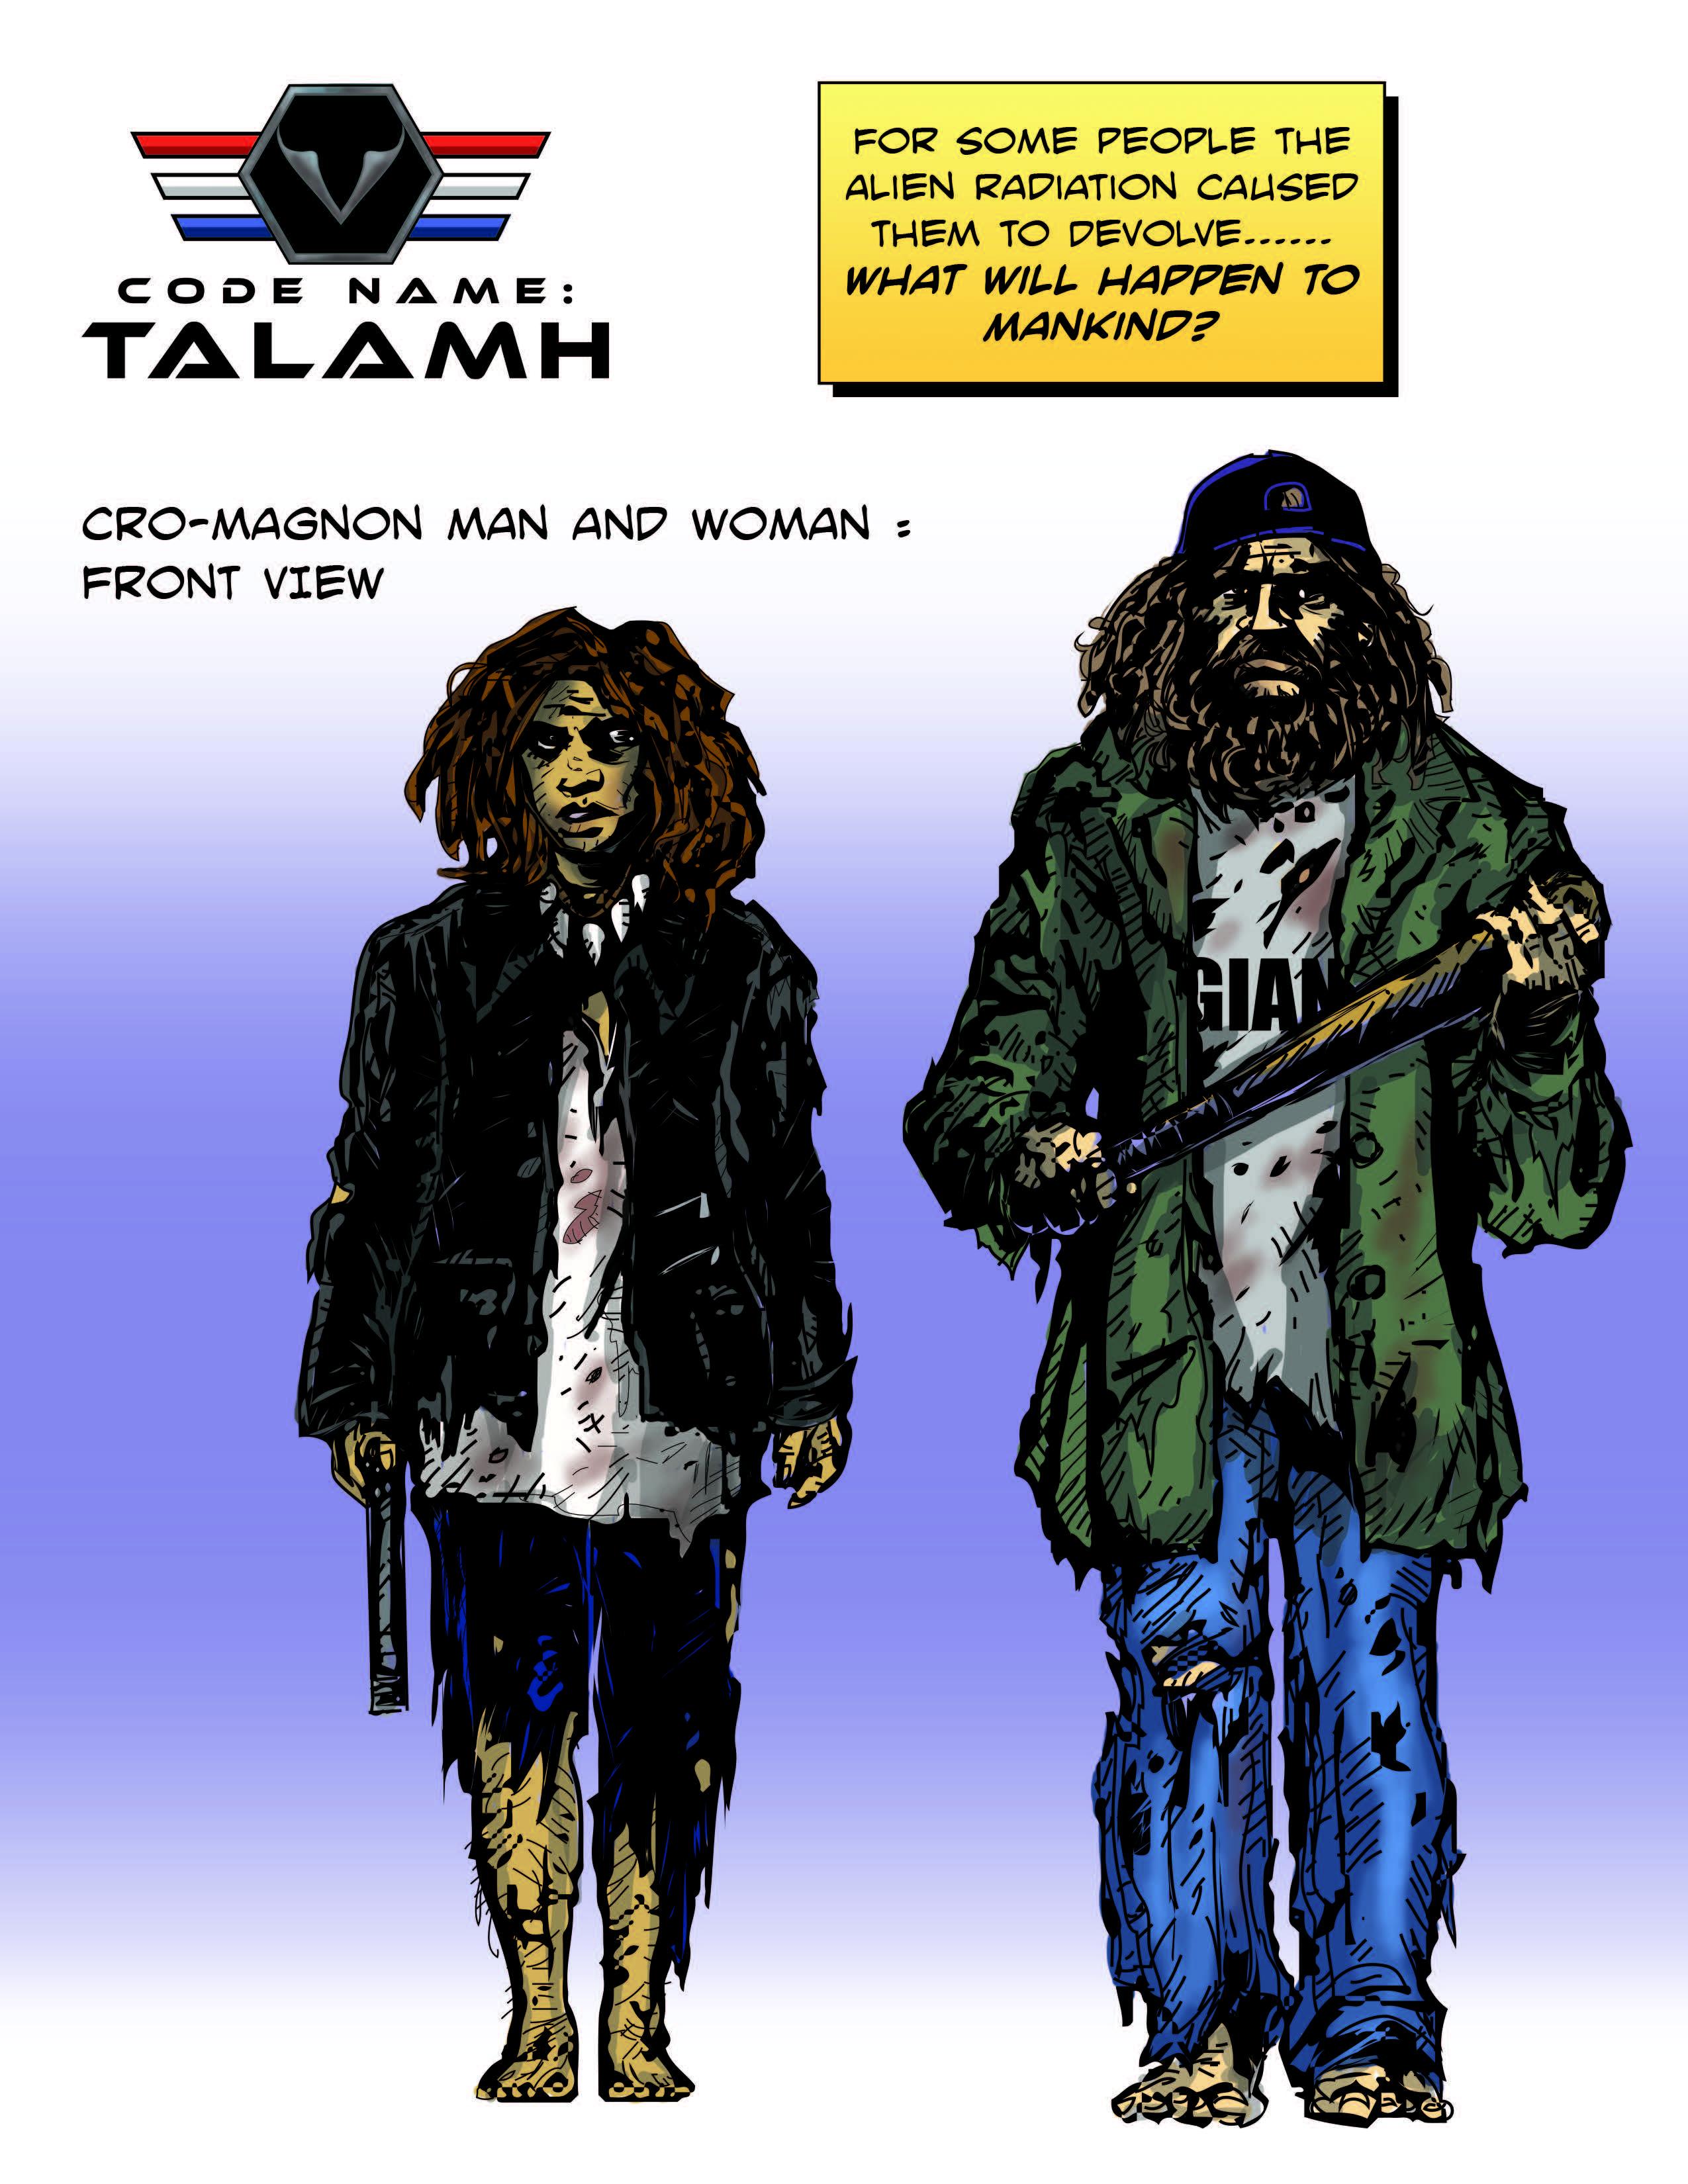 Cro-Mags-Code Name: Talamh